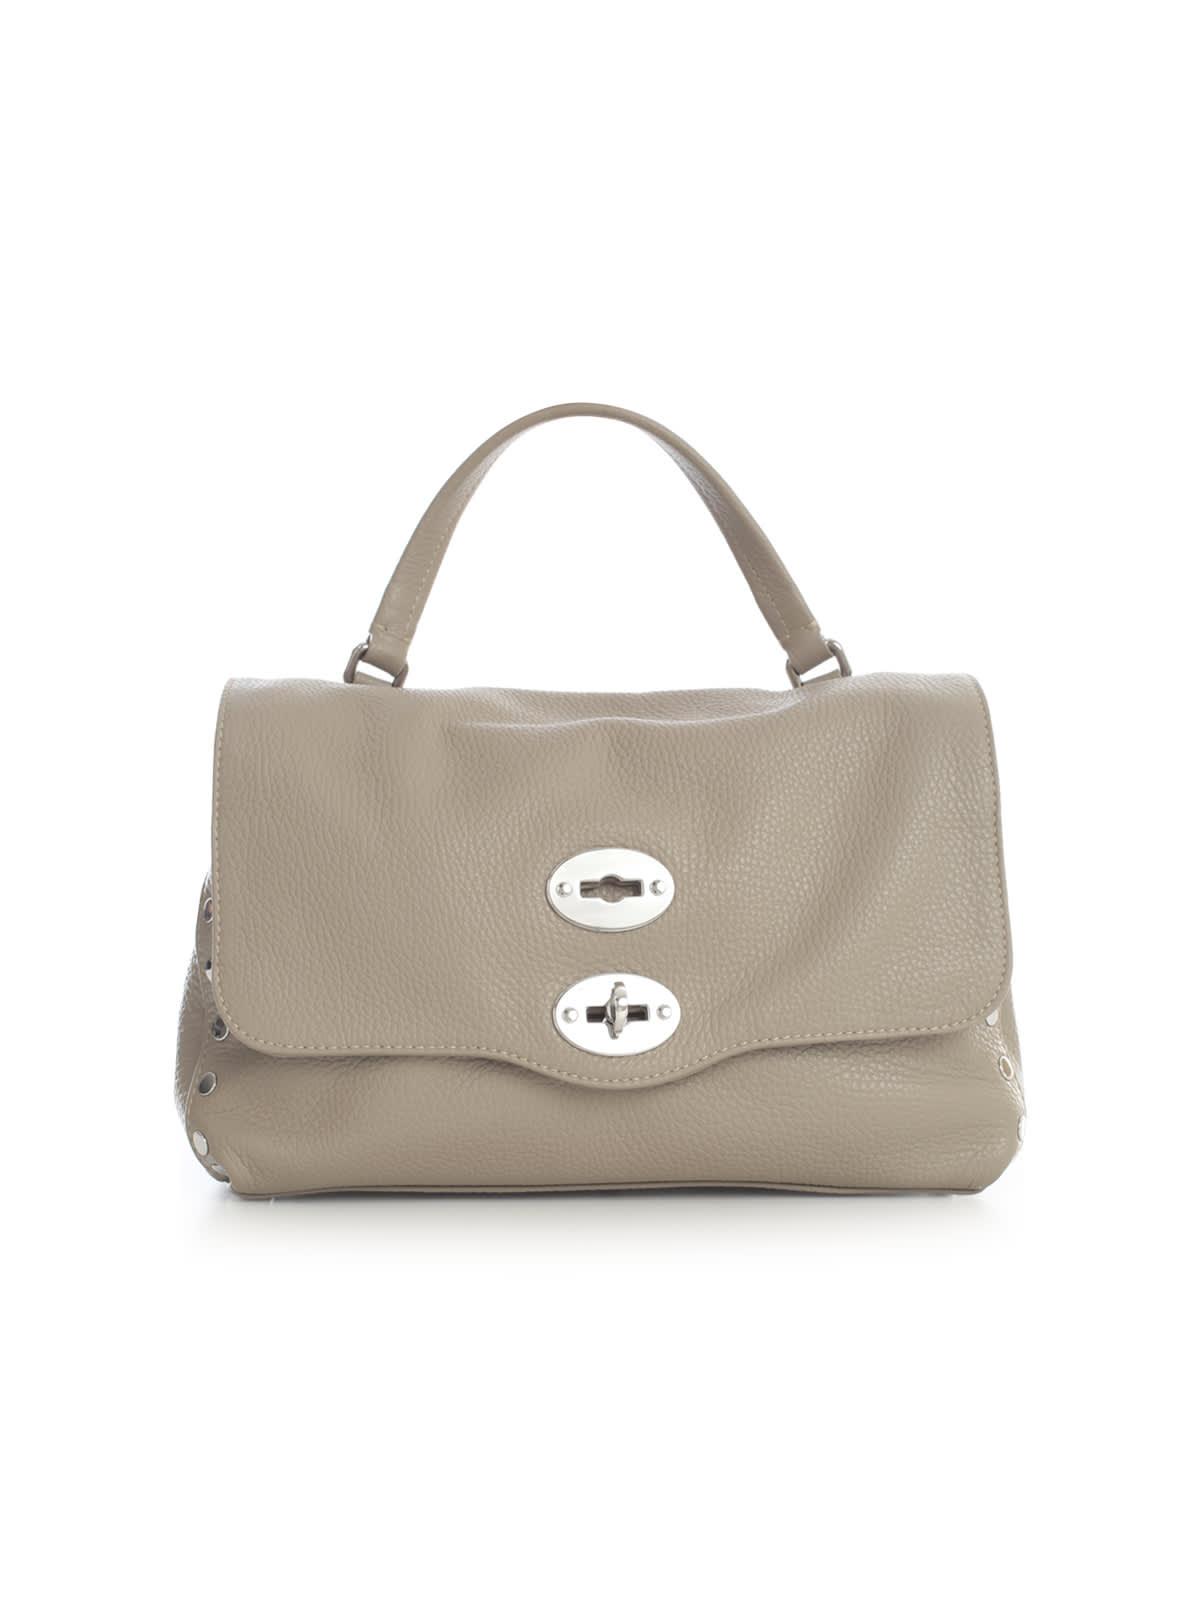 Zanellato Shoulder bags SMALL POSTINA 18 SHOULDER BAG